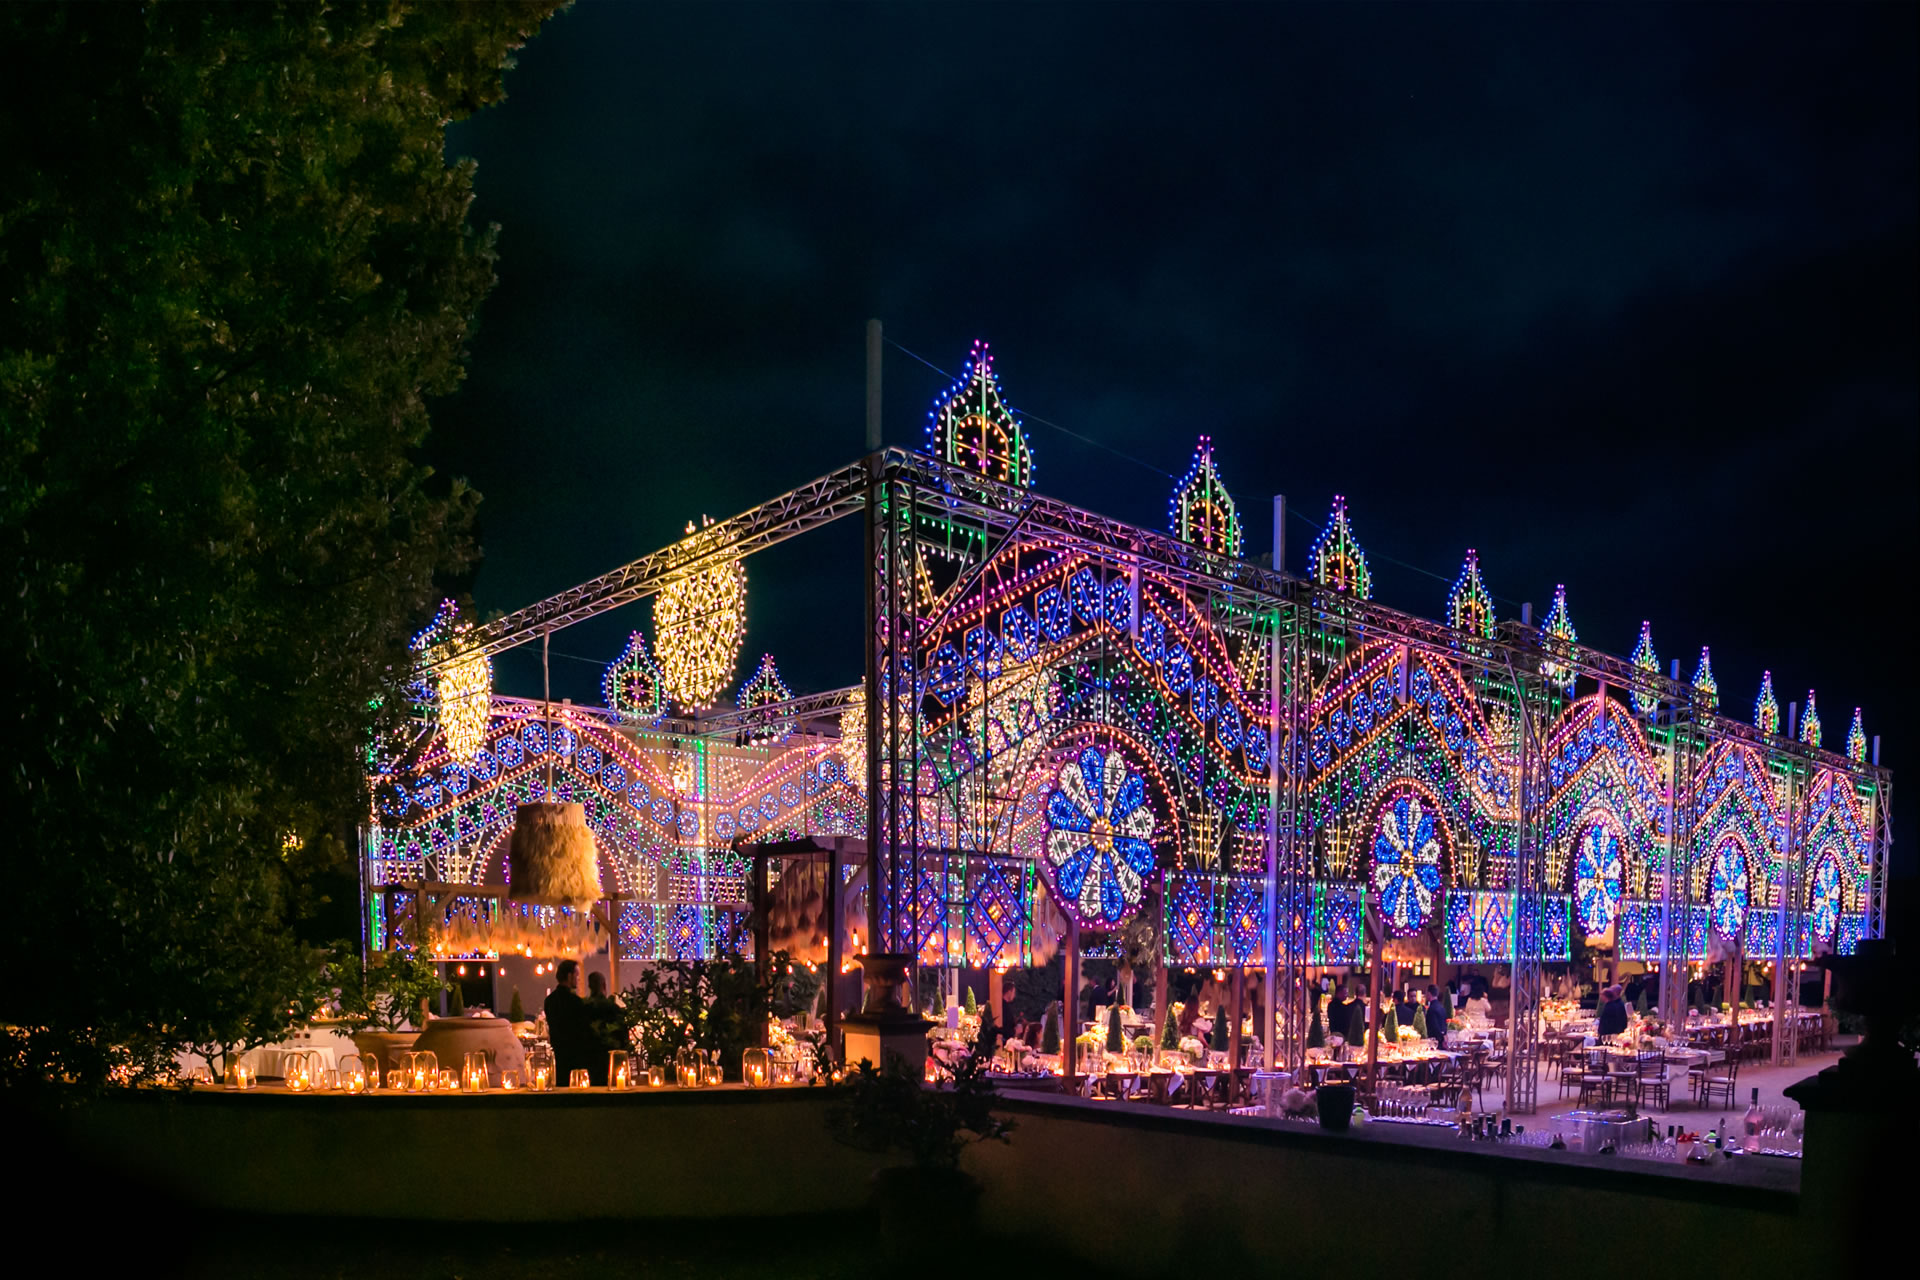 Lights - 44 :: Luxury wedding at Il Borro :: Luxury wedding photography - 43 :: Lights - 44